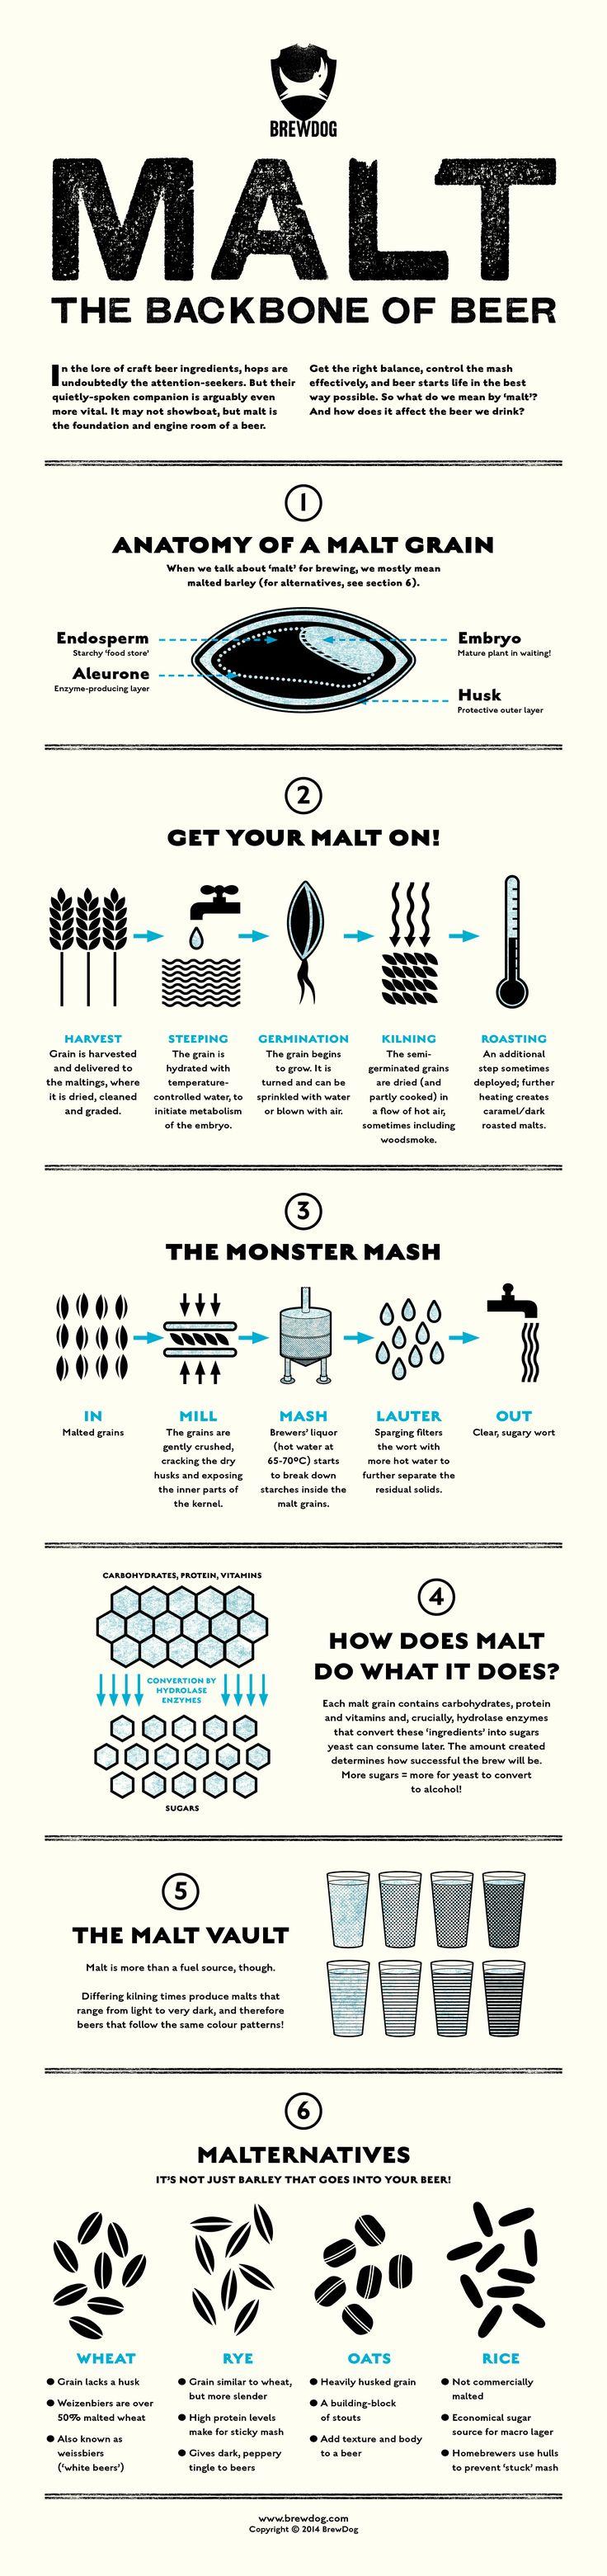 Infographic Malt the Backbone of Beer